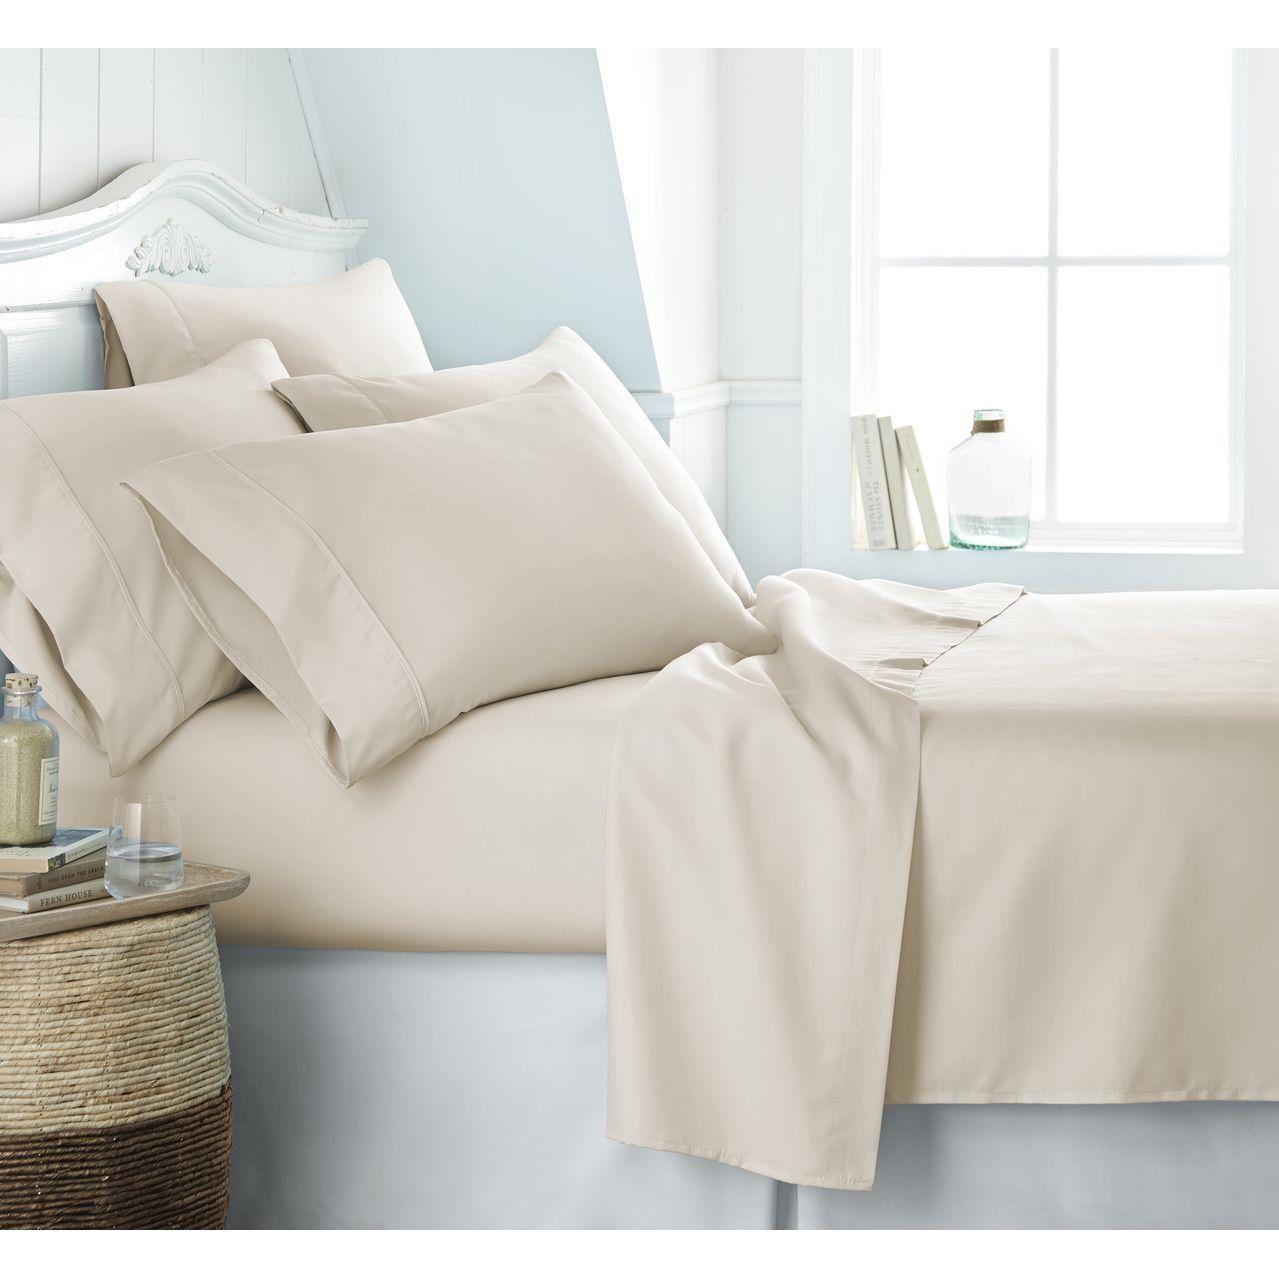 Luxury best bedding pcs duvet set egyptian cotton tc ivory